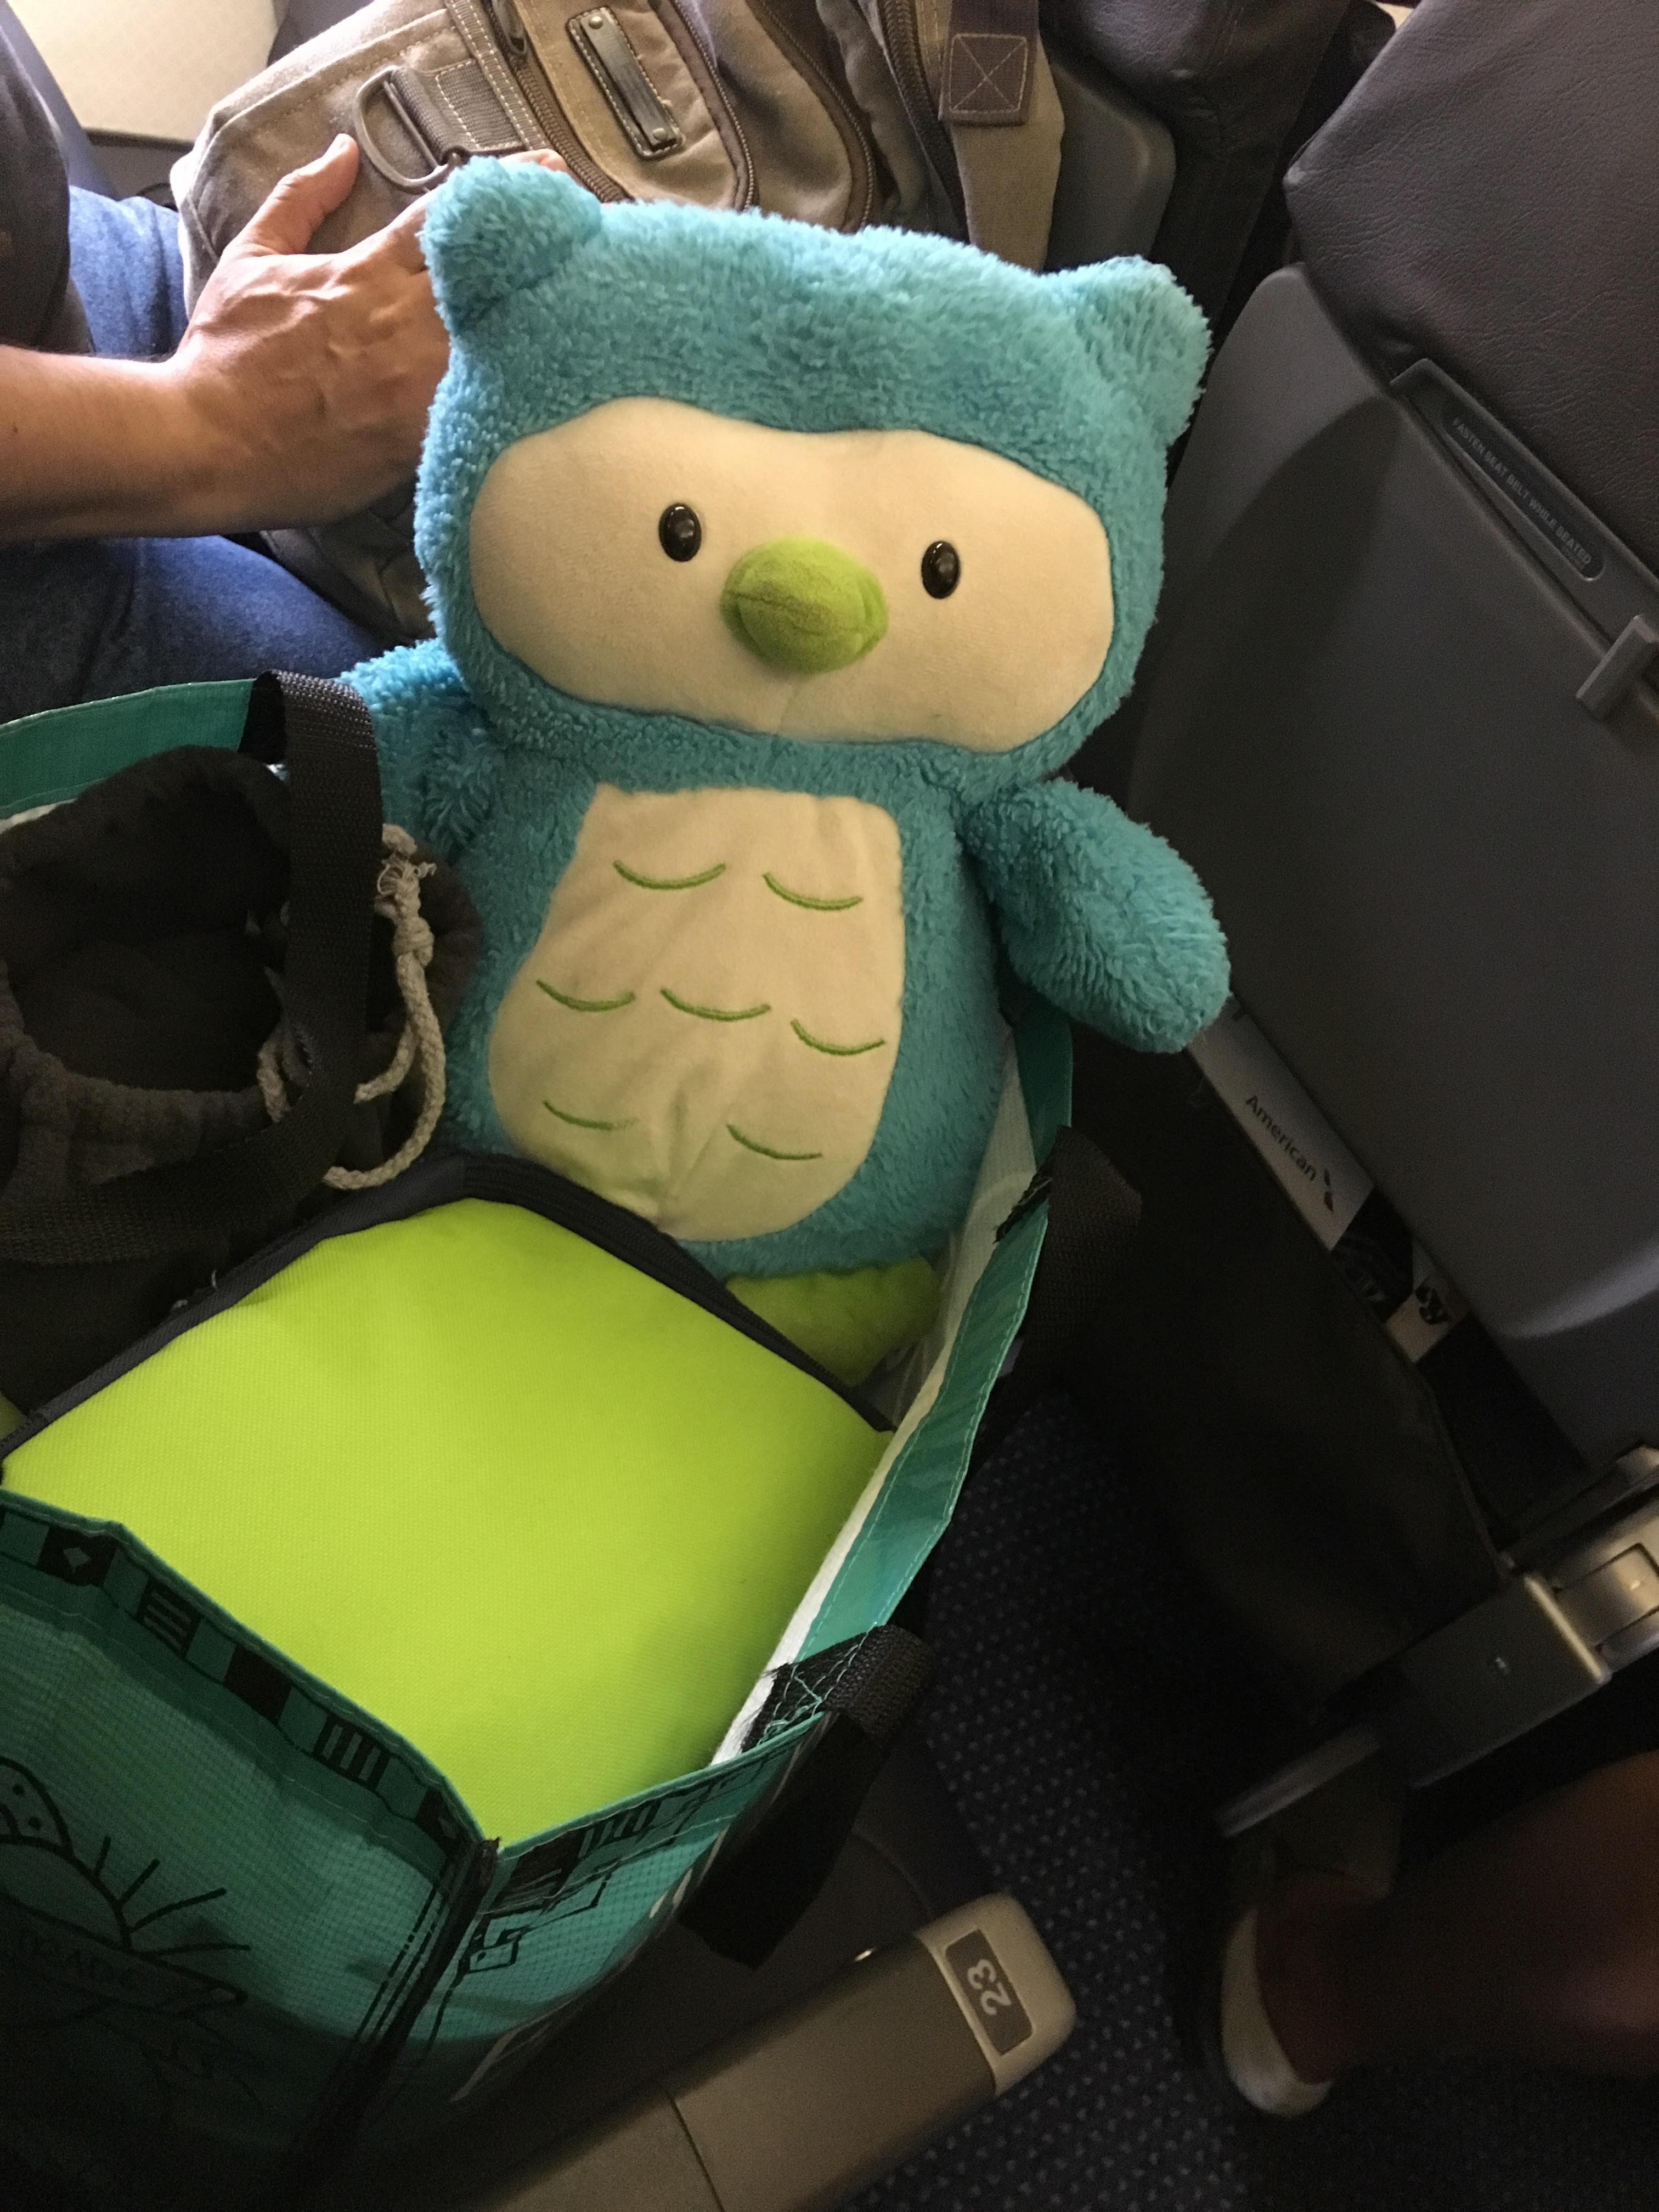 My travel buddy Chella